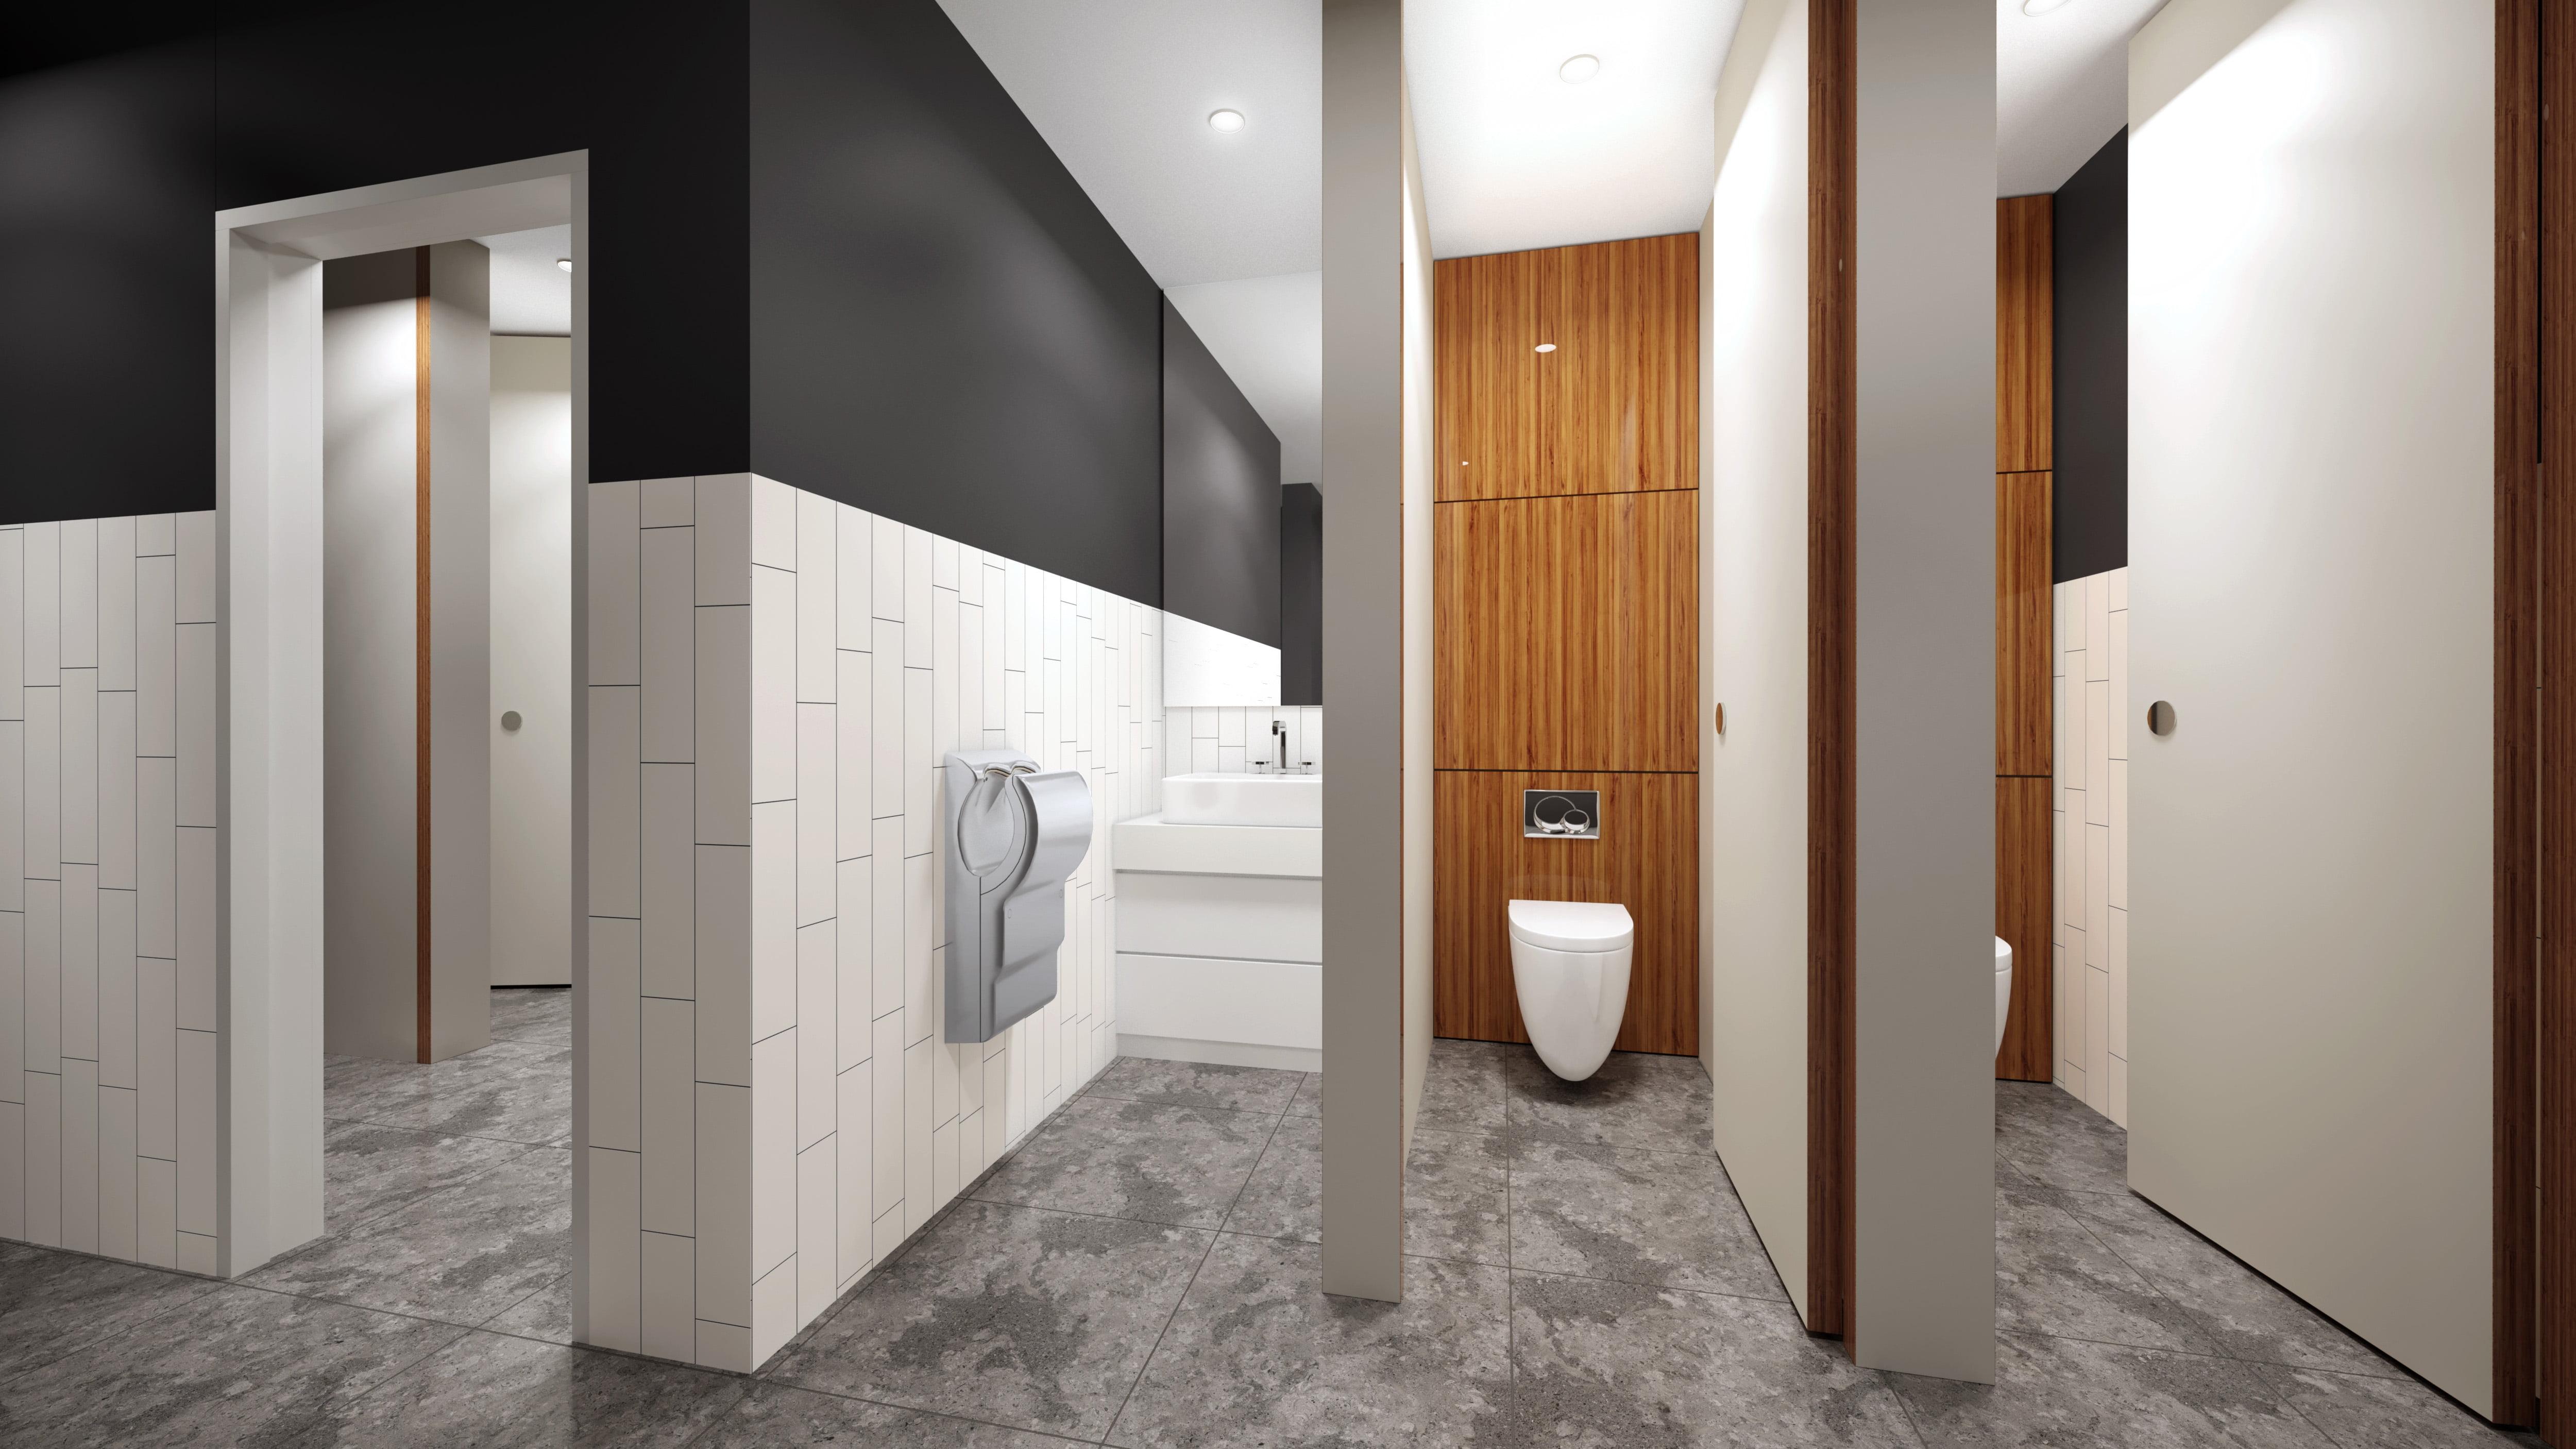 New Kieghley Office Client Bathroom